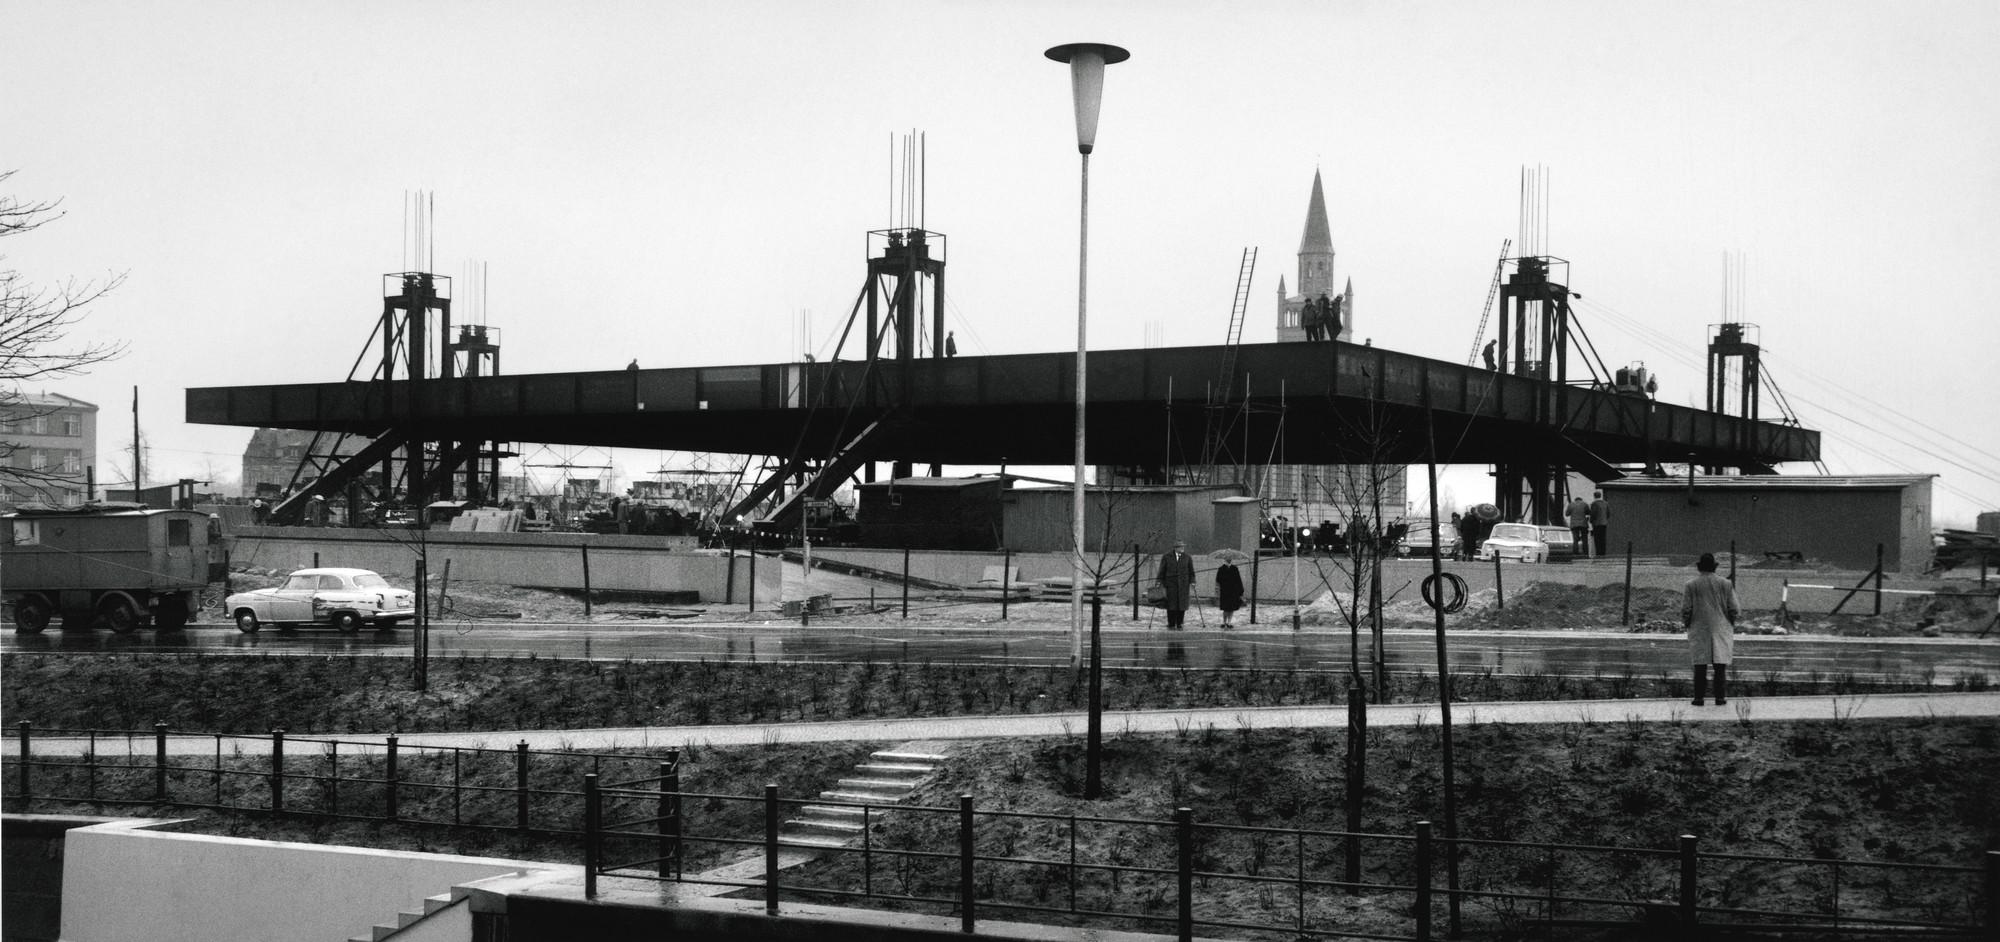 Sobresaliendo del techo, 5 de abril de 1967. Imagen © Archiv Neue Nationalgalerie, Nationalgalerie, Staatliche Museen zu Berlin